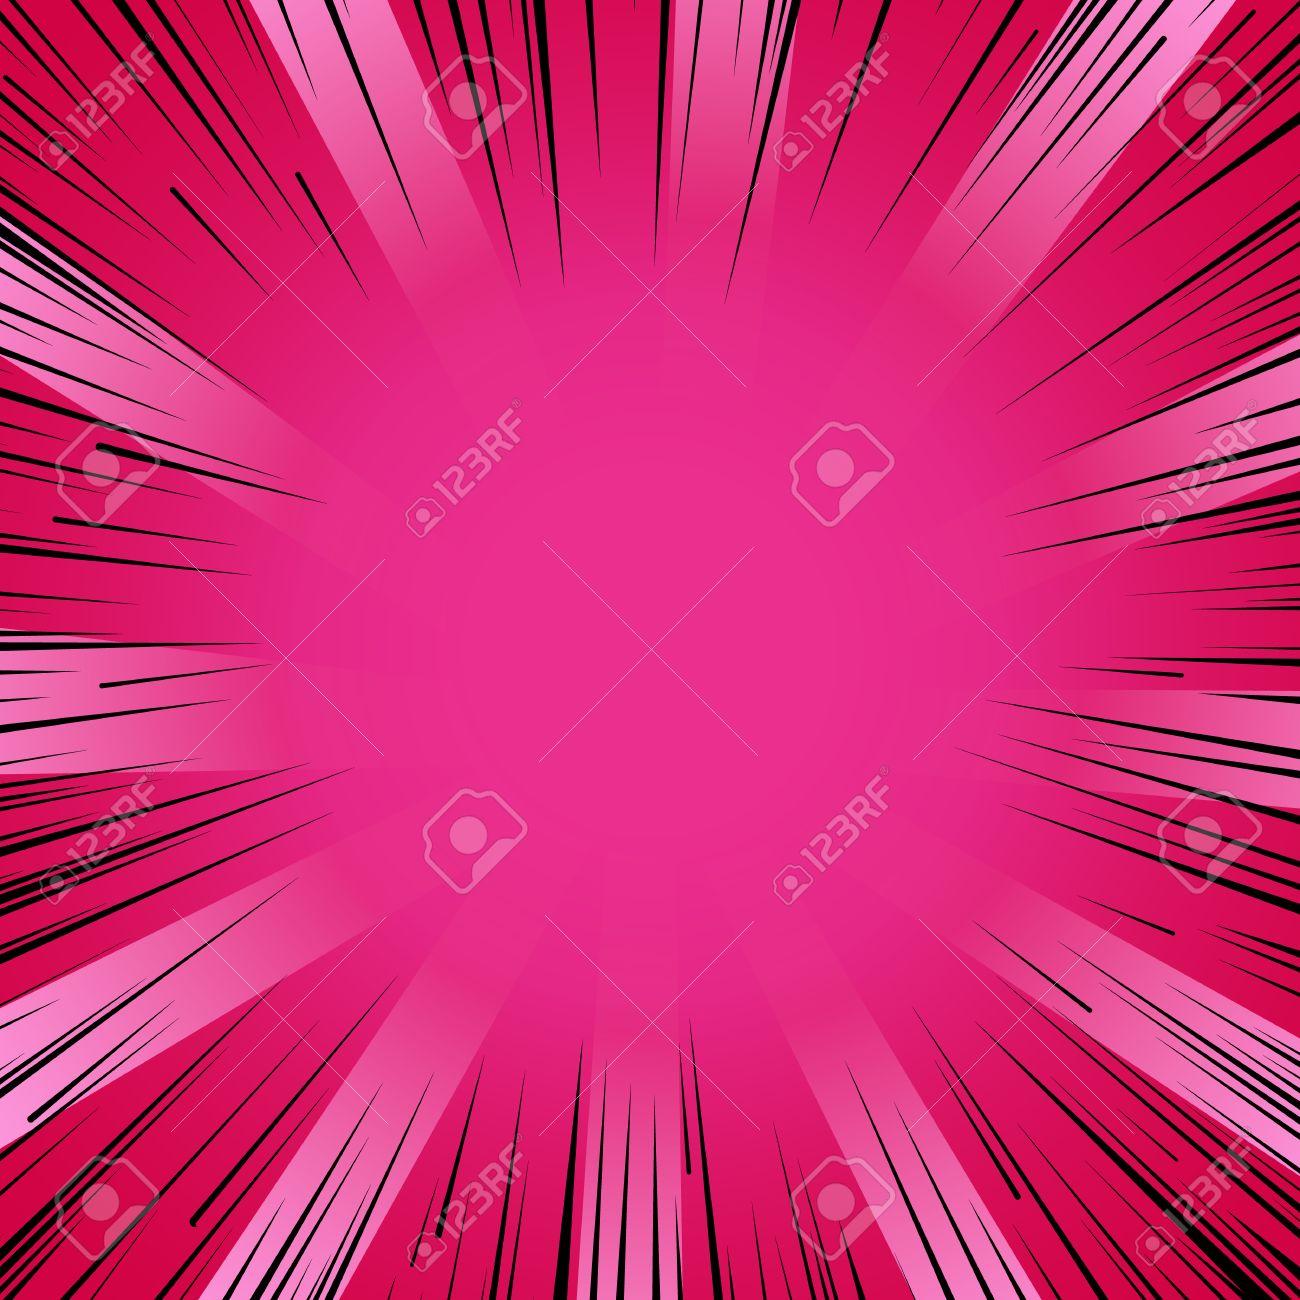 Abstract comic book flash explosion radial lines background. Vector illustration for superhero design. Bright black pink light strip burst. Flash ray blast glow Manga cartoon hero fight cute print - 53985444